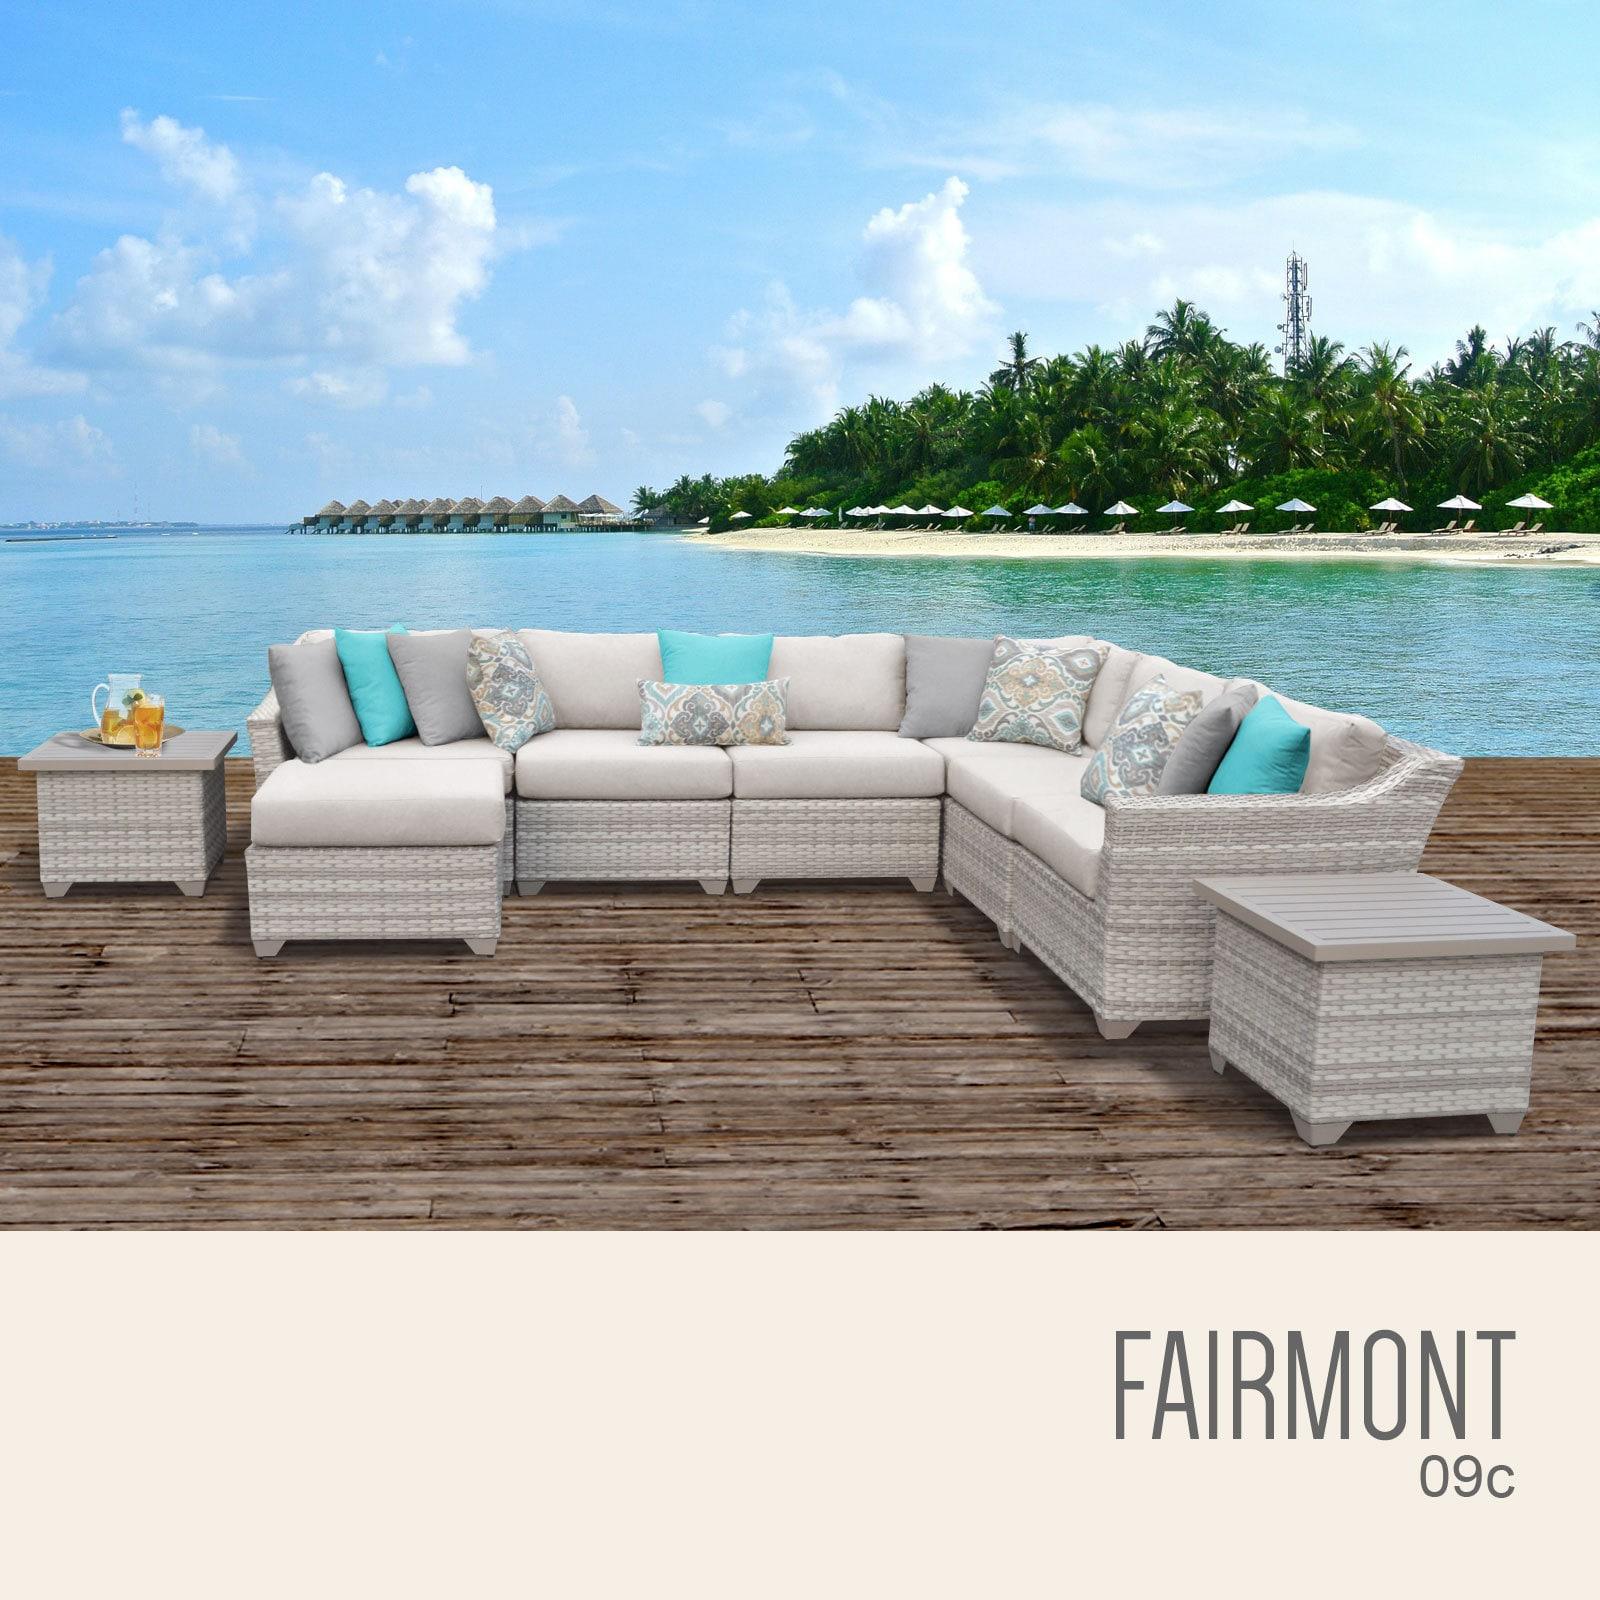 Fairmont 9 Piece Outdoor Wicker Patio Furniture Set 09c